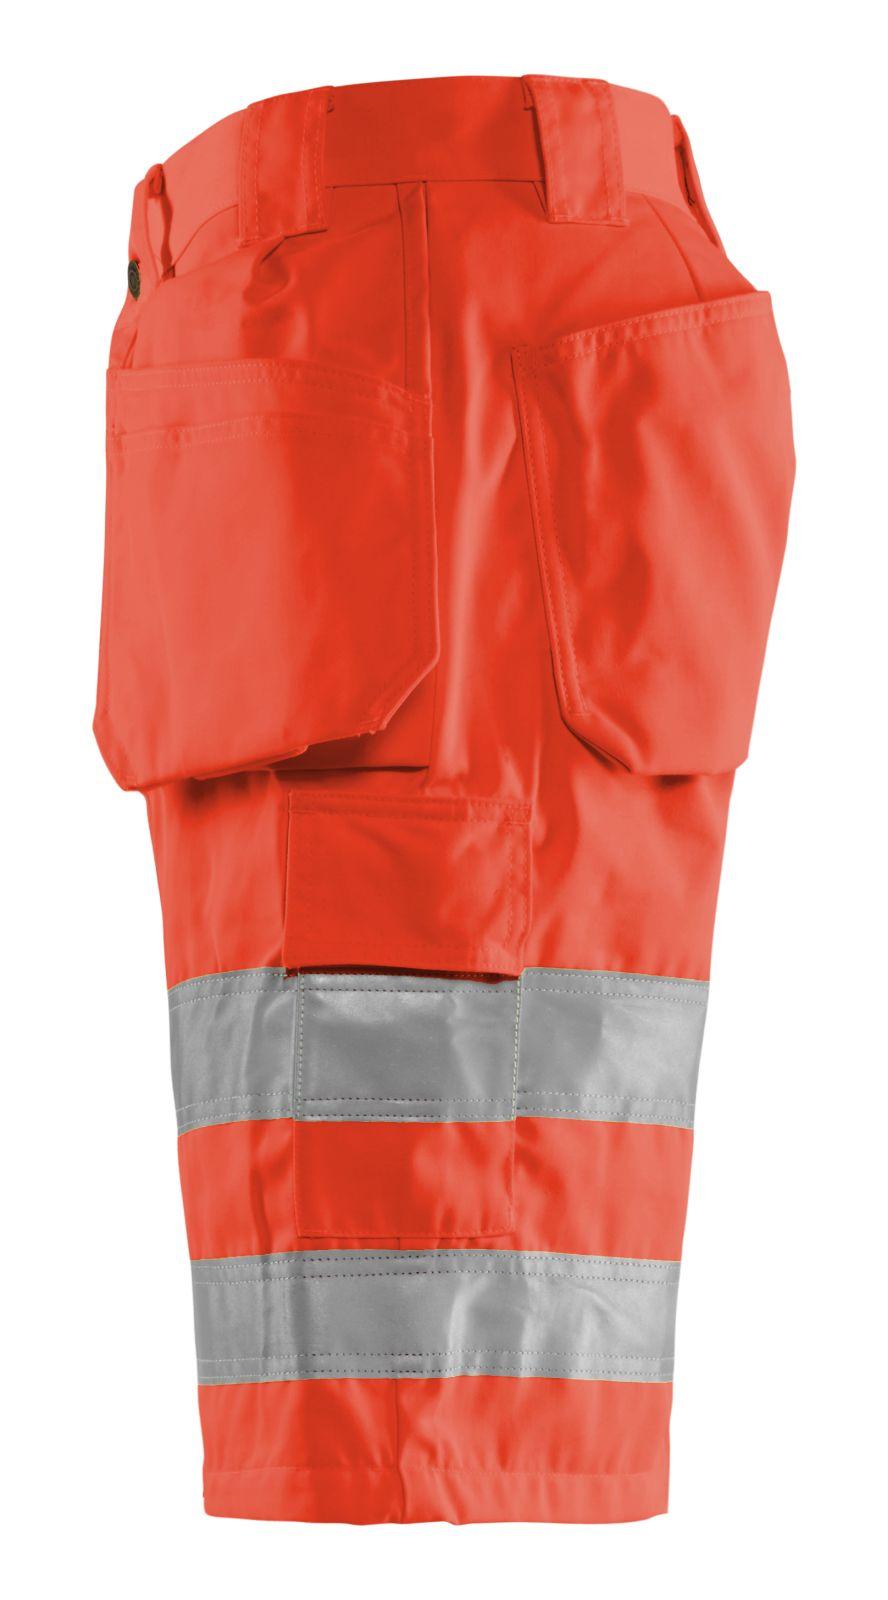 Blaklader Korte werkbroeken 15351804 High Vis fluor rood(5500)